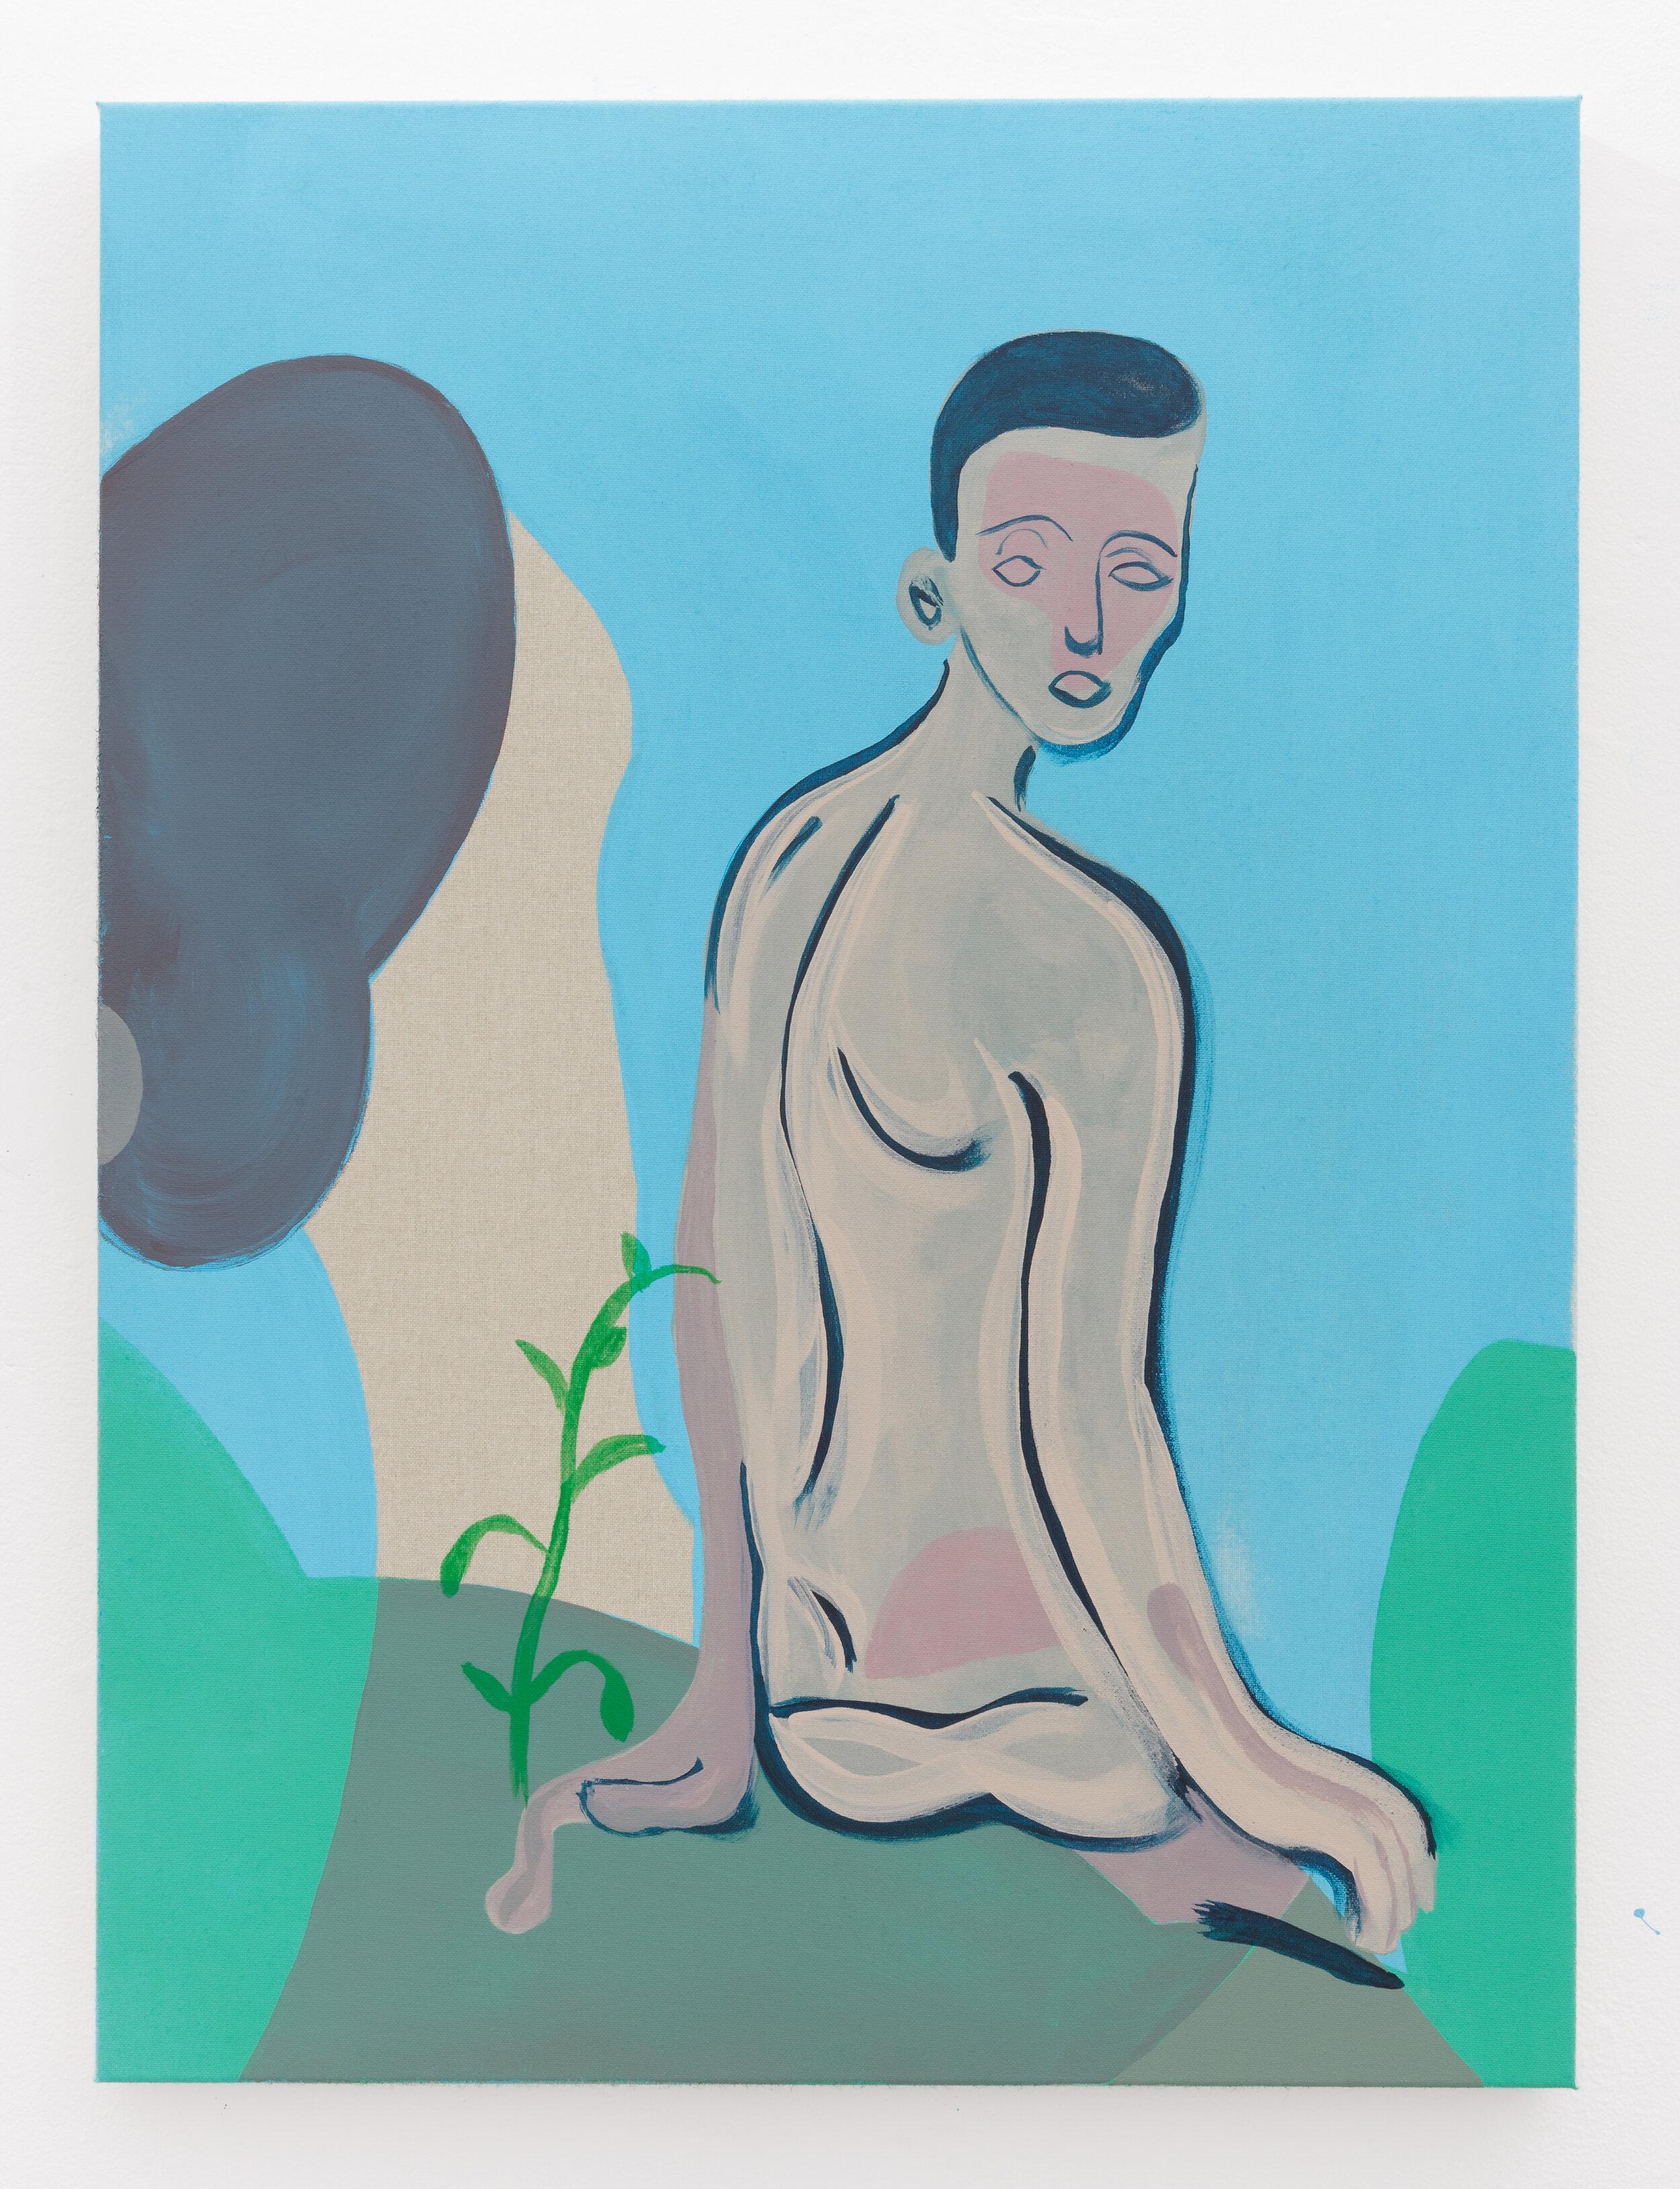 Cedalion , 2018. Acrylic on polyester, 68.5 x 51 cm.